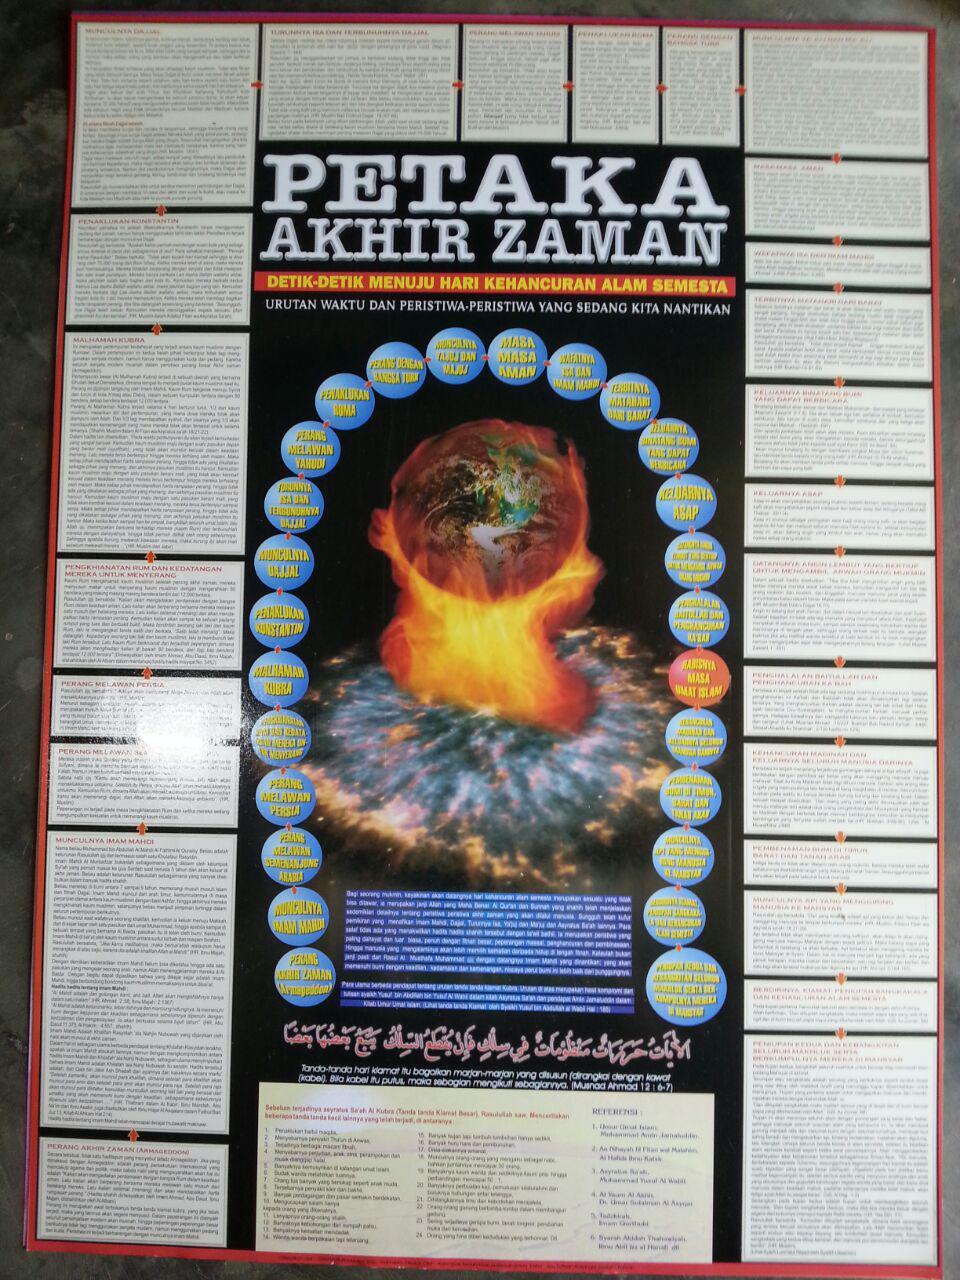 Poster Petaka Akhir Zaman